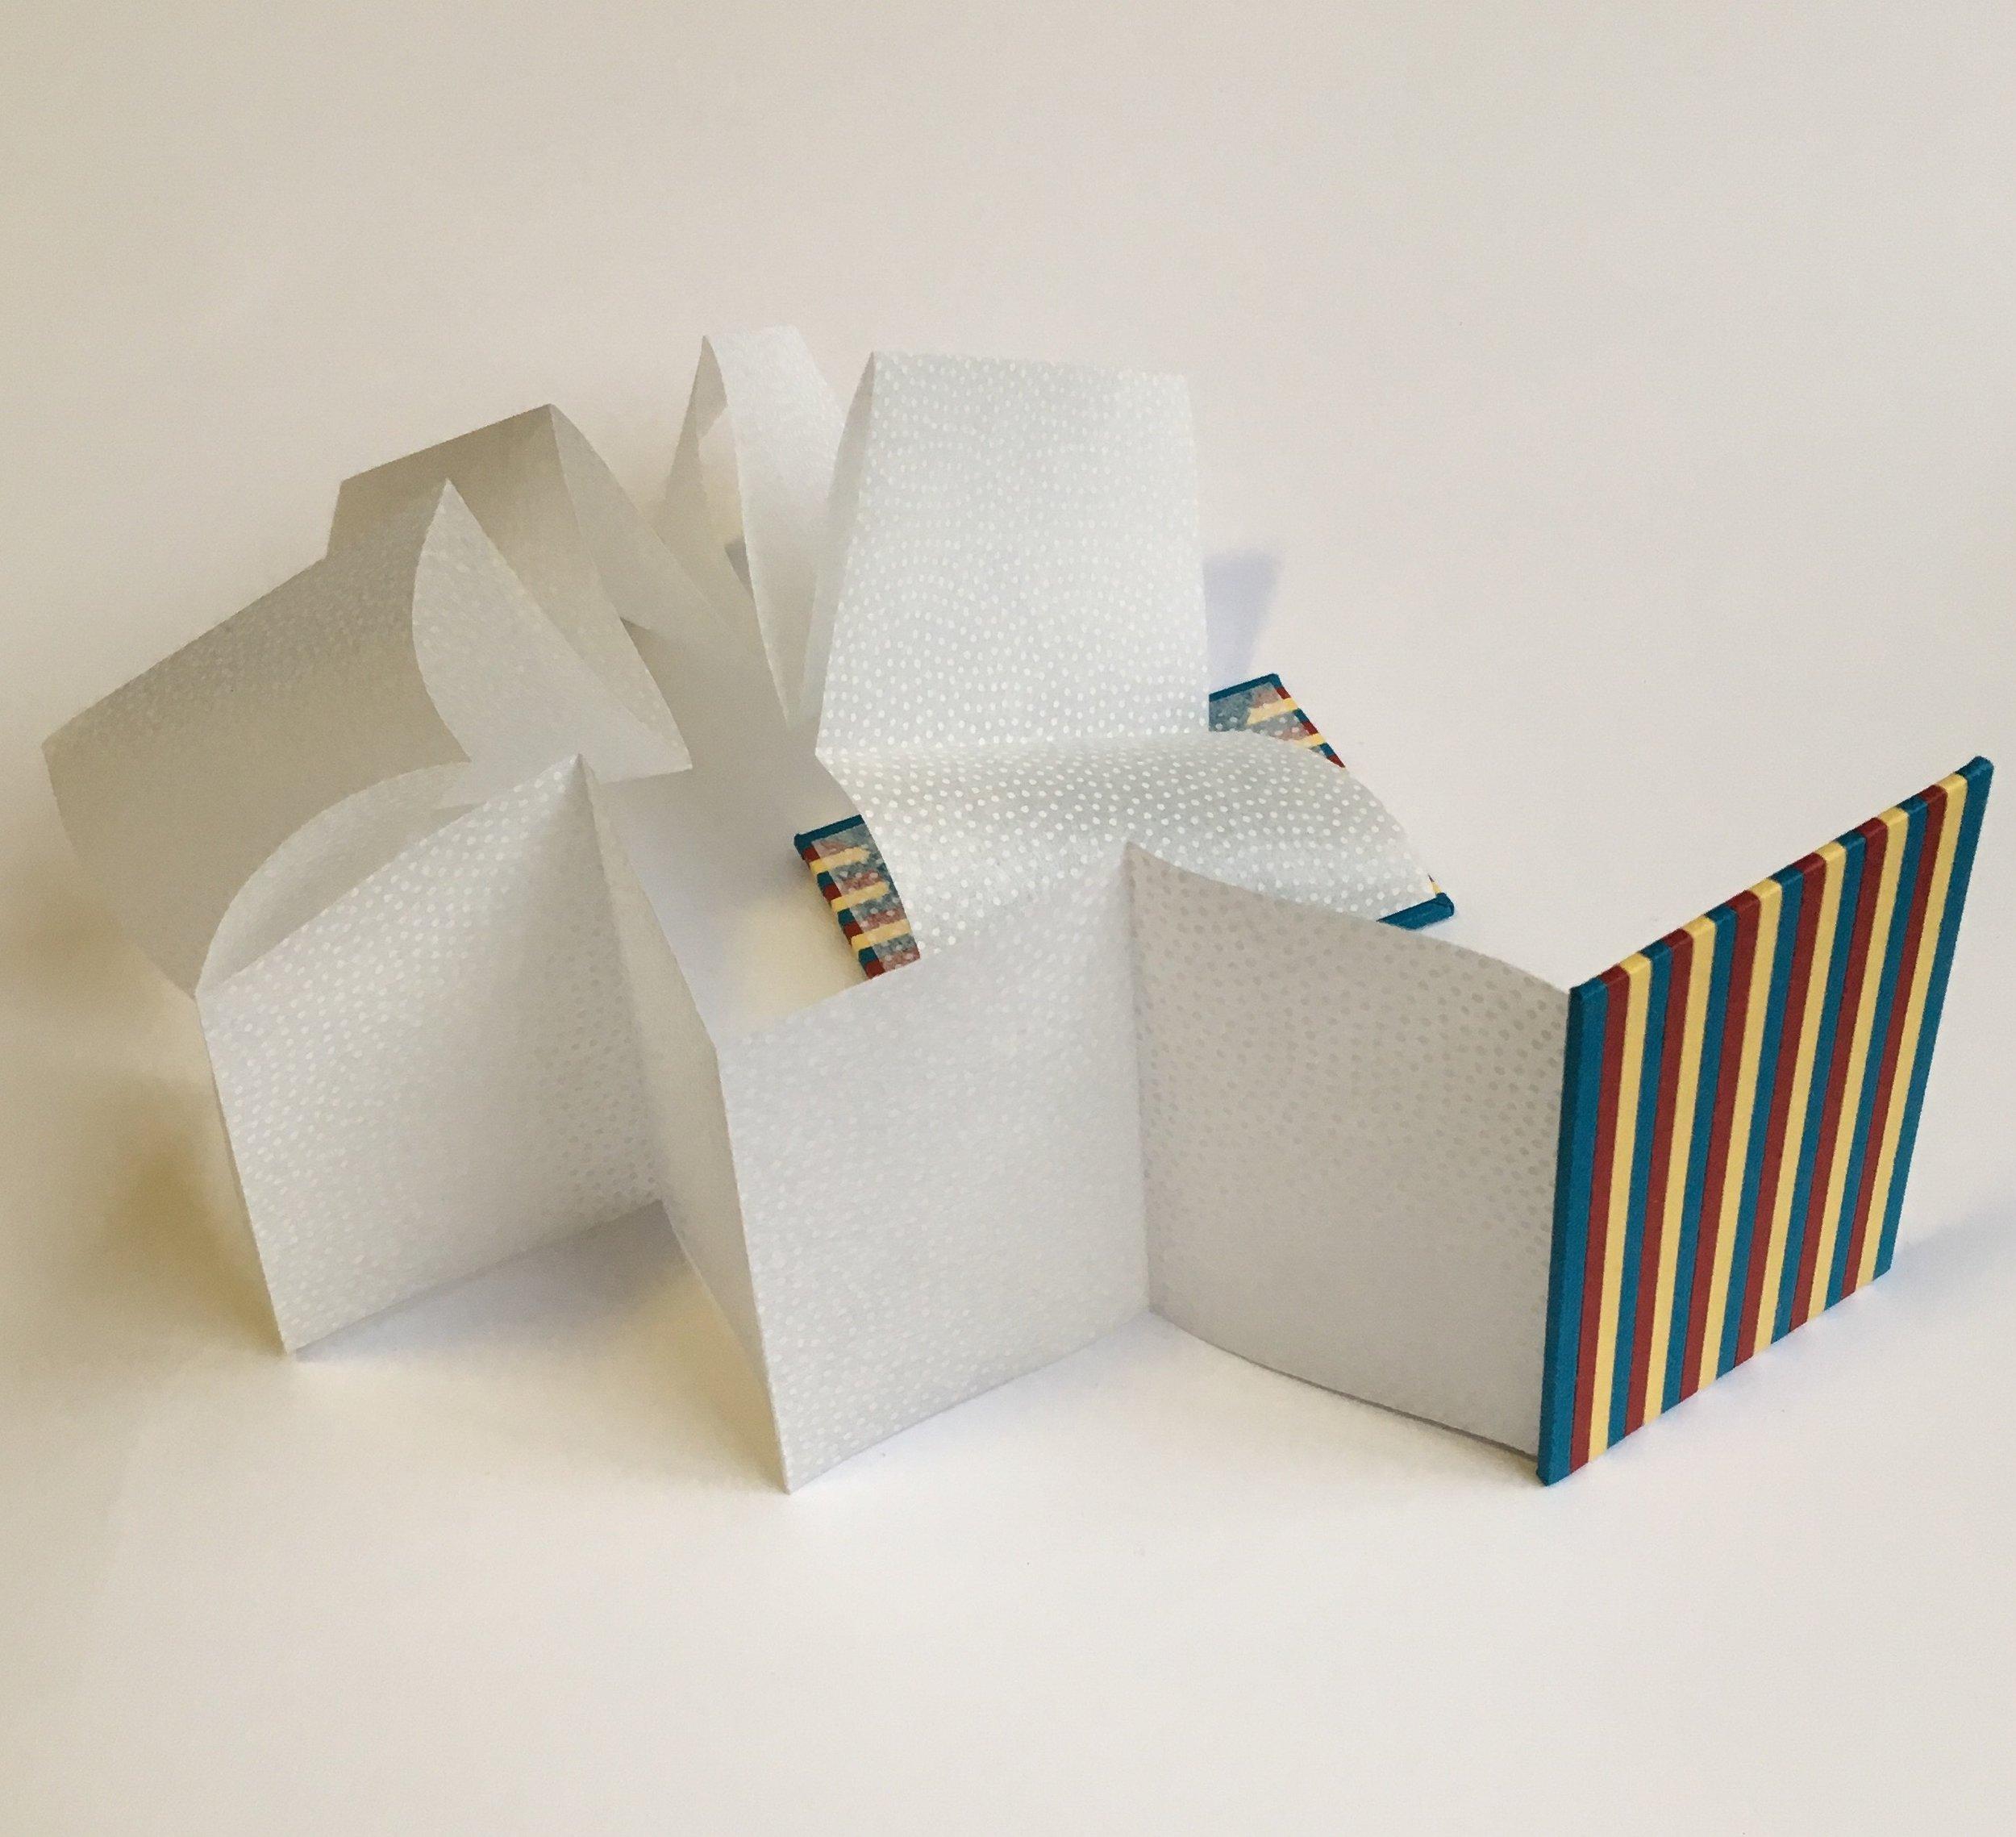 Bespoke concertina binding